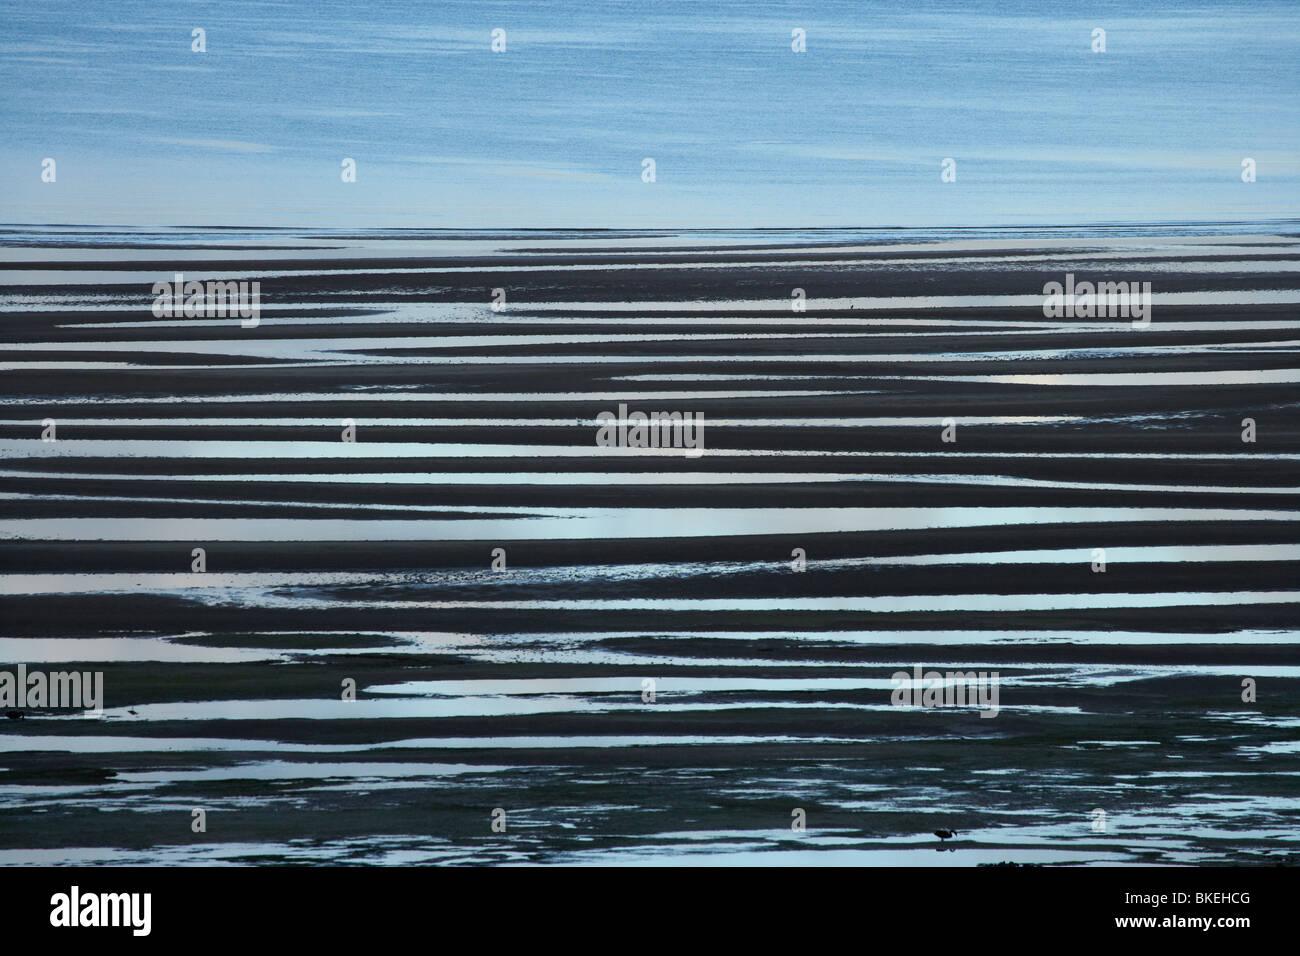 Puddles on Tidal Flats at Low Tide, Perkins Bay, near Stanley, Northwest Tasmania, Australia - Stock Image